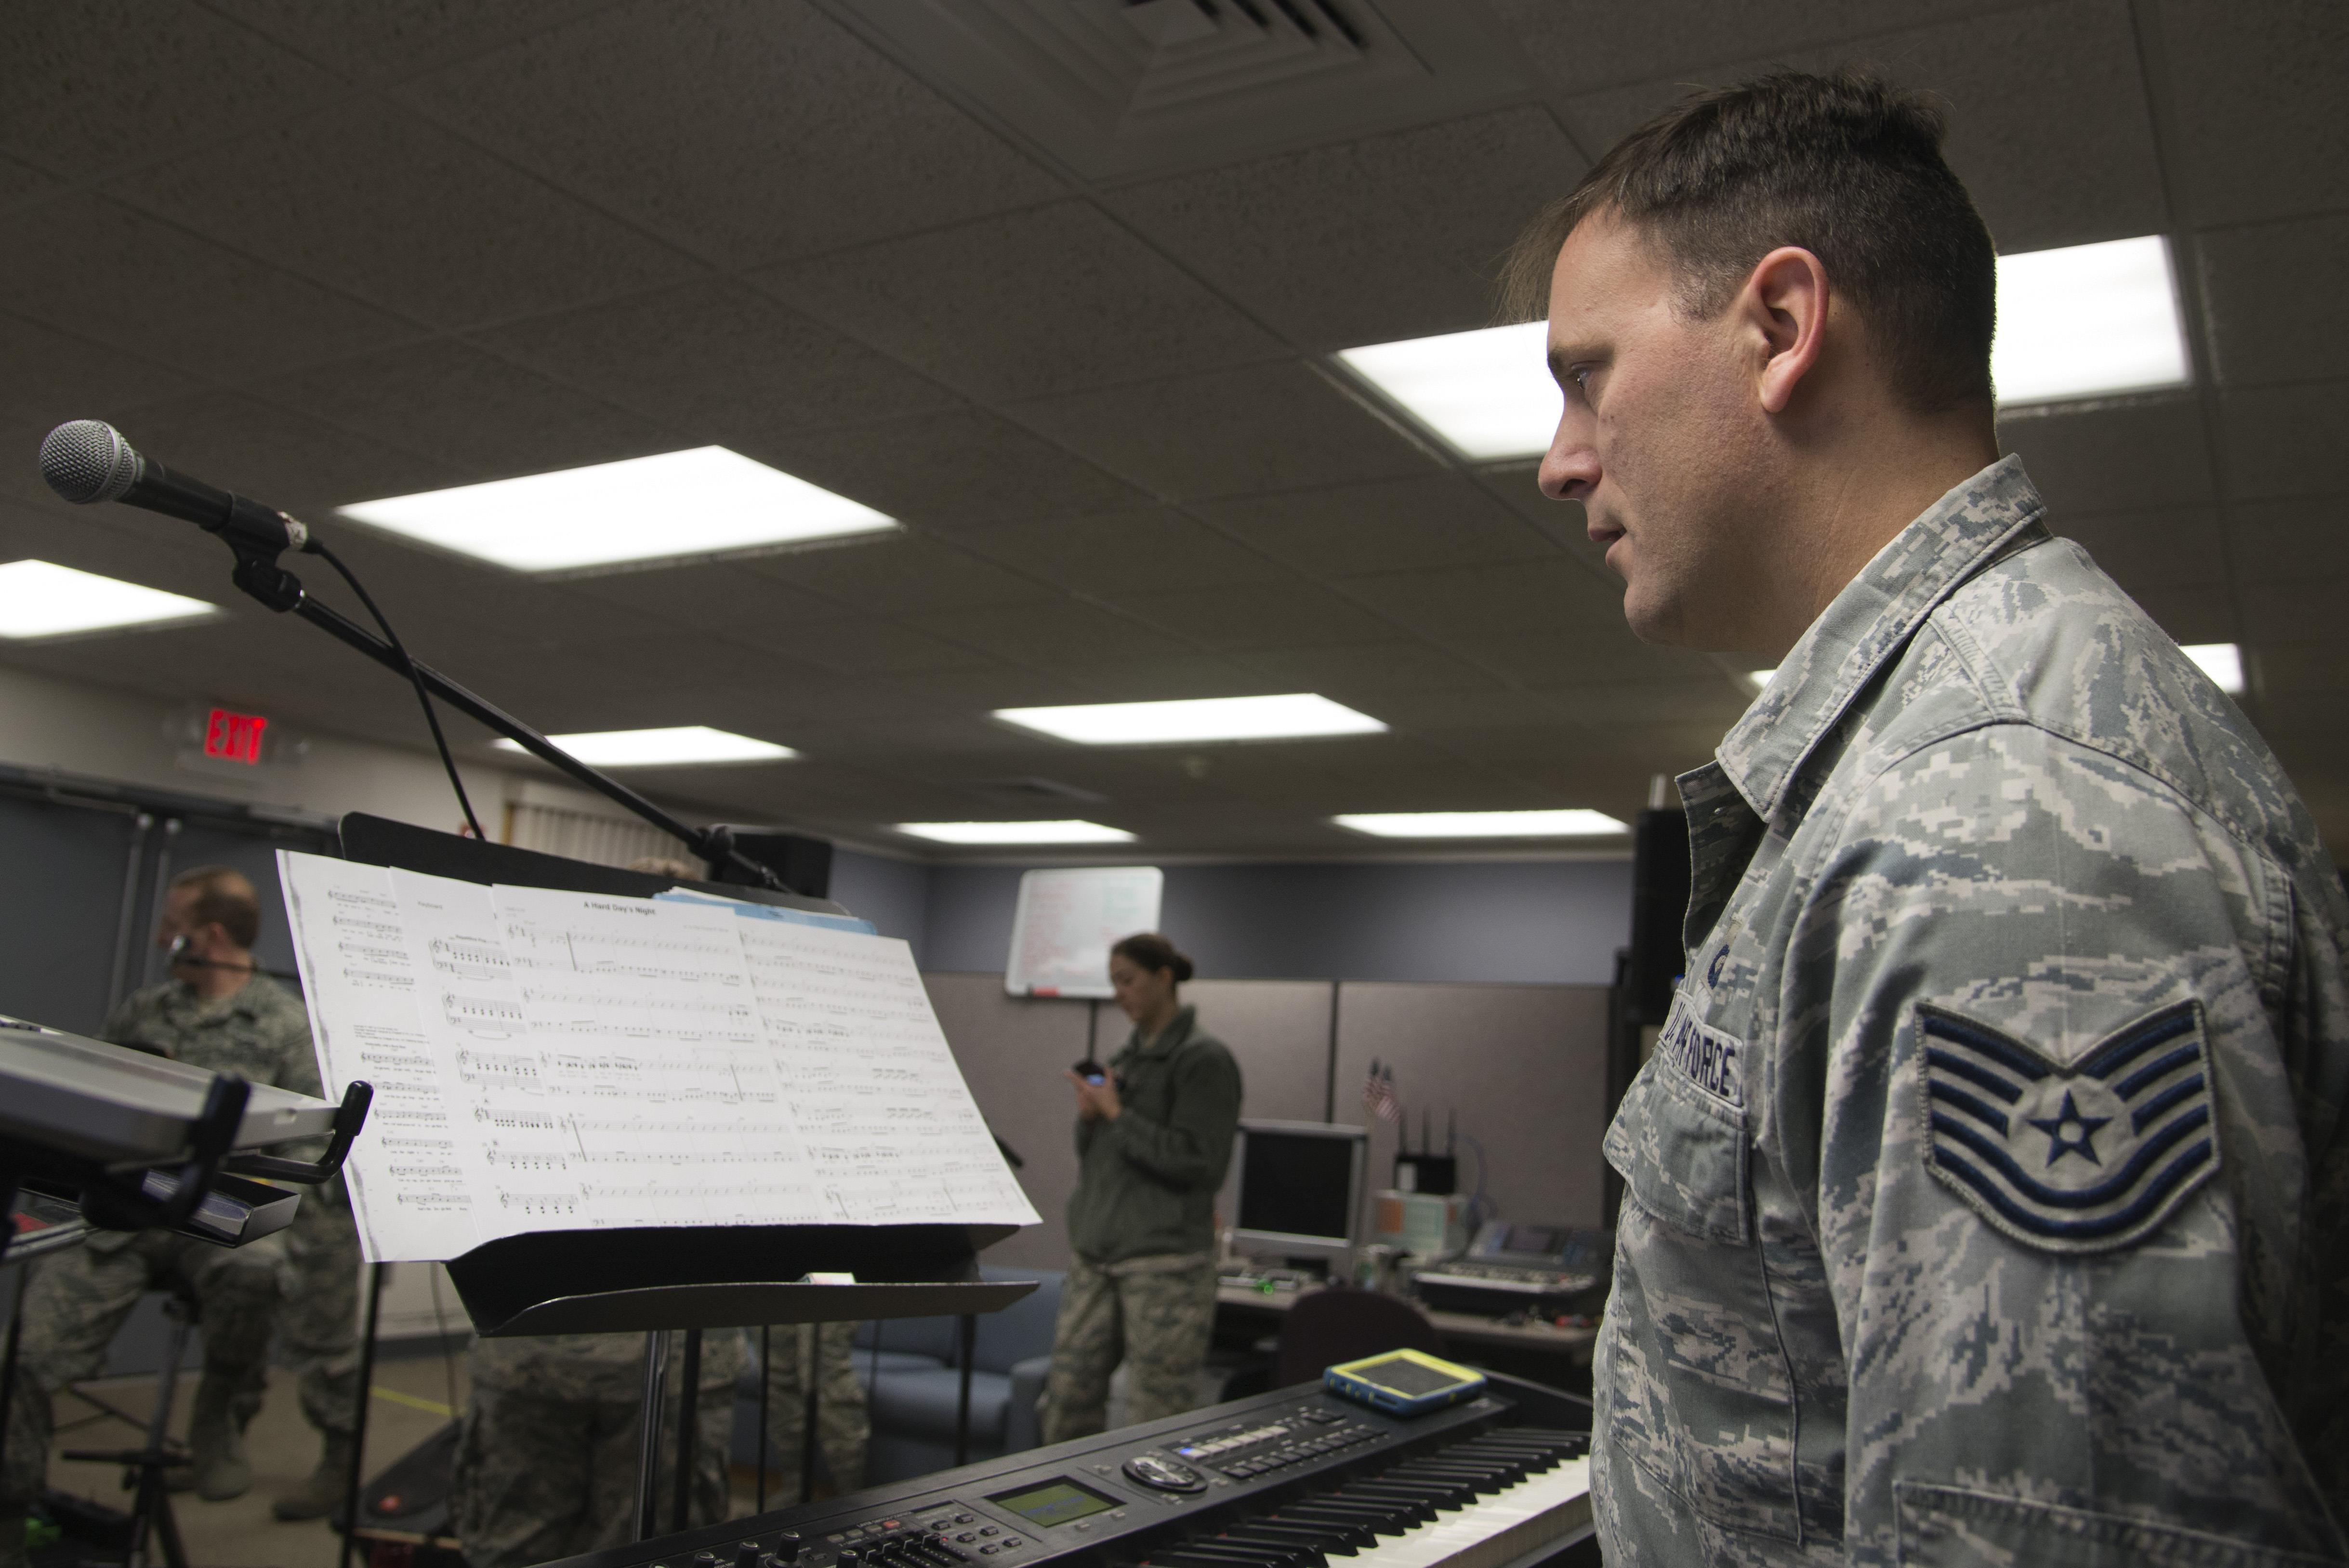 scott air force base single guys 100% free online dating in scott air force base 1,500,000 daily active members.